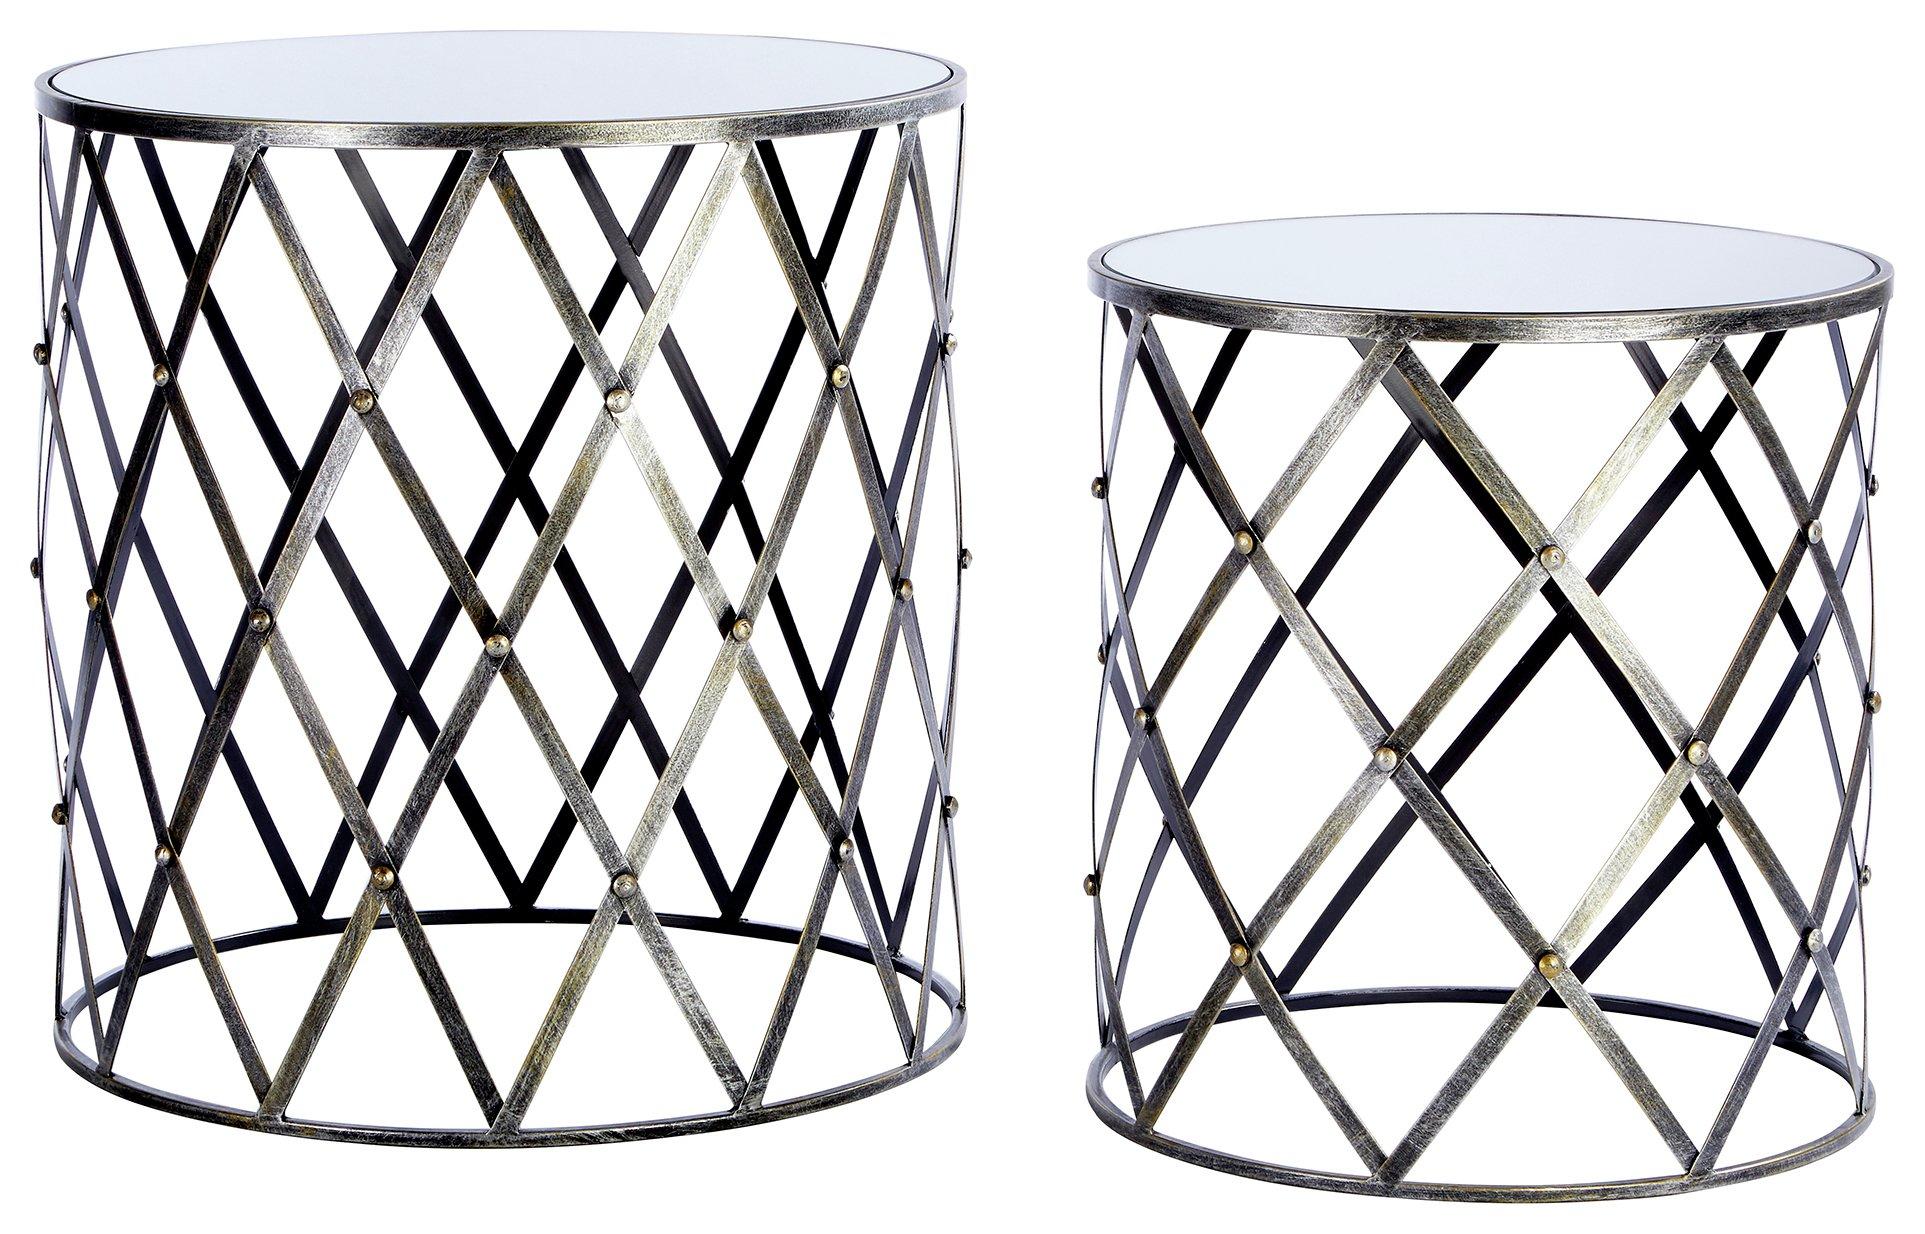 Premier Housewares Avantis Nest of 2 Tables - Silver Frame